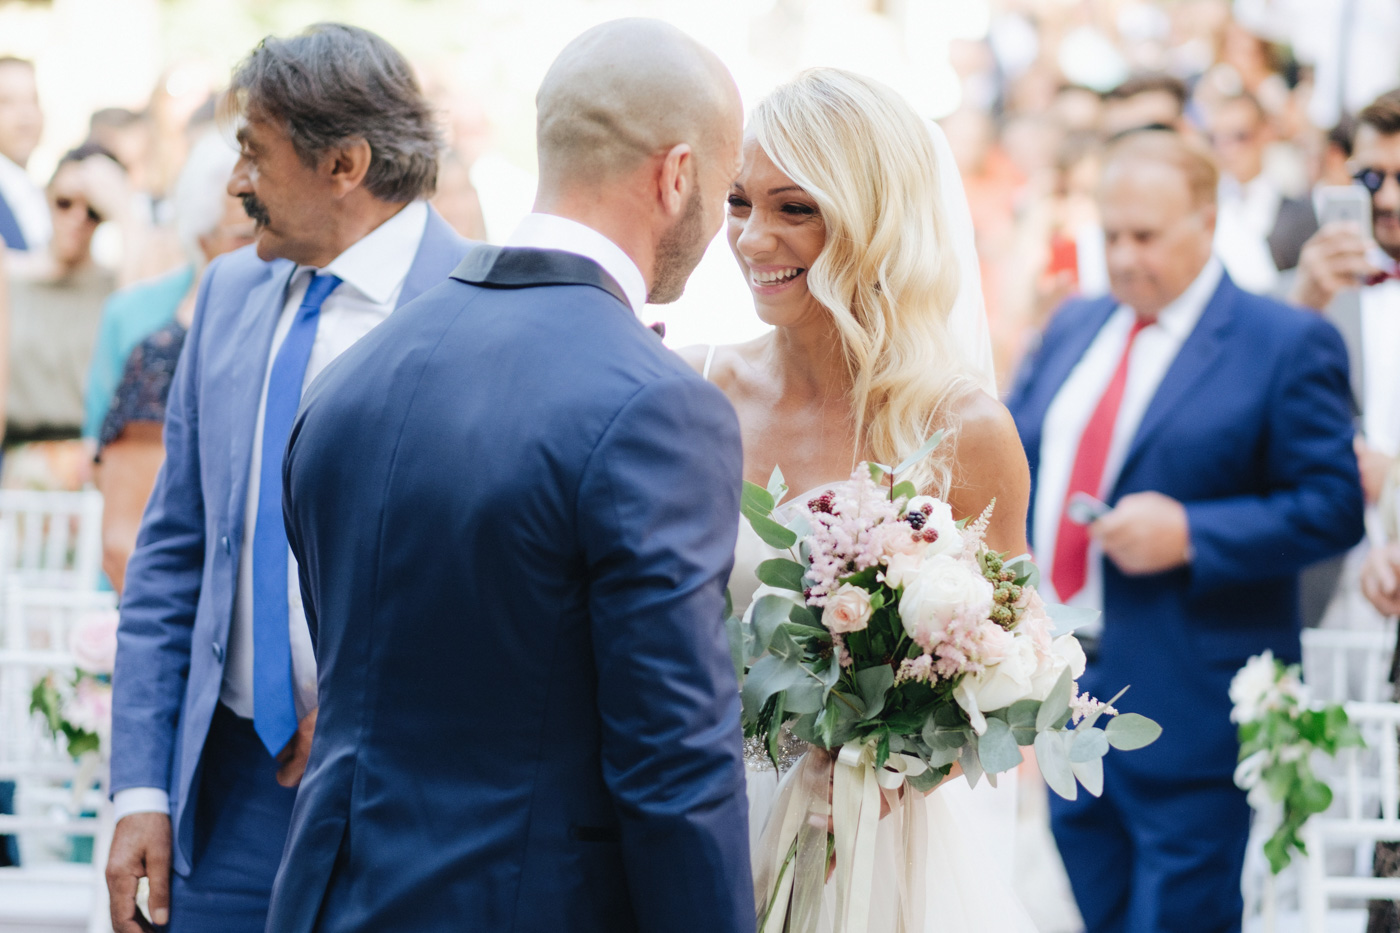 Matrimoni all'italiana wedding photographer italy-65.jpg